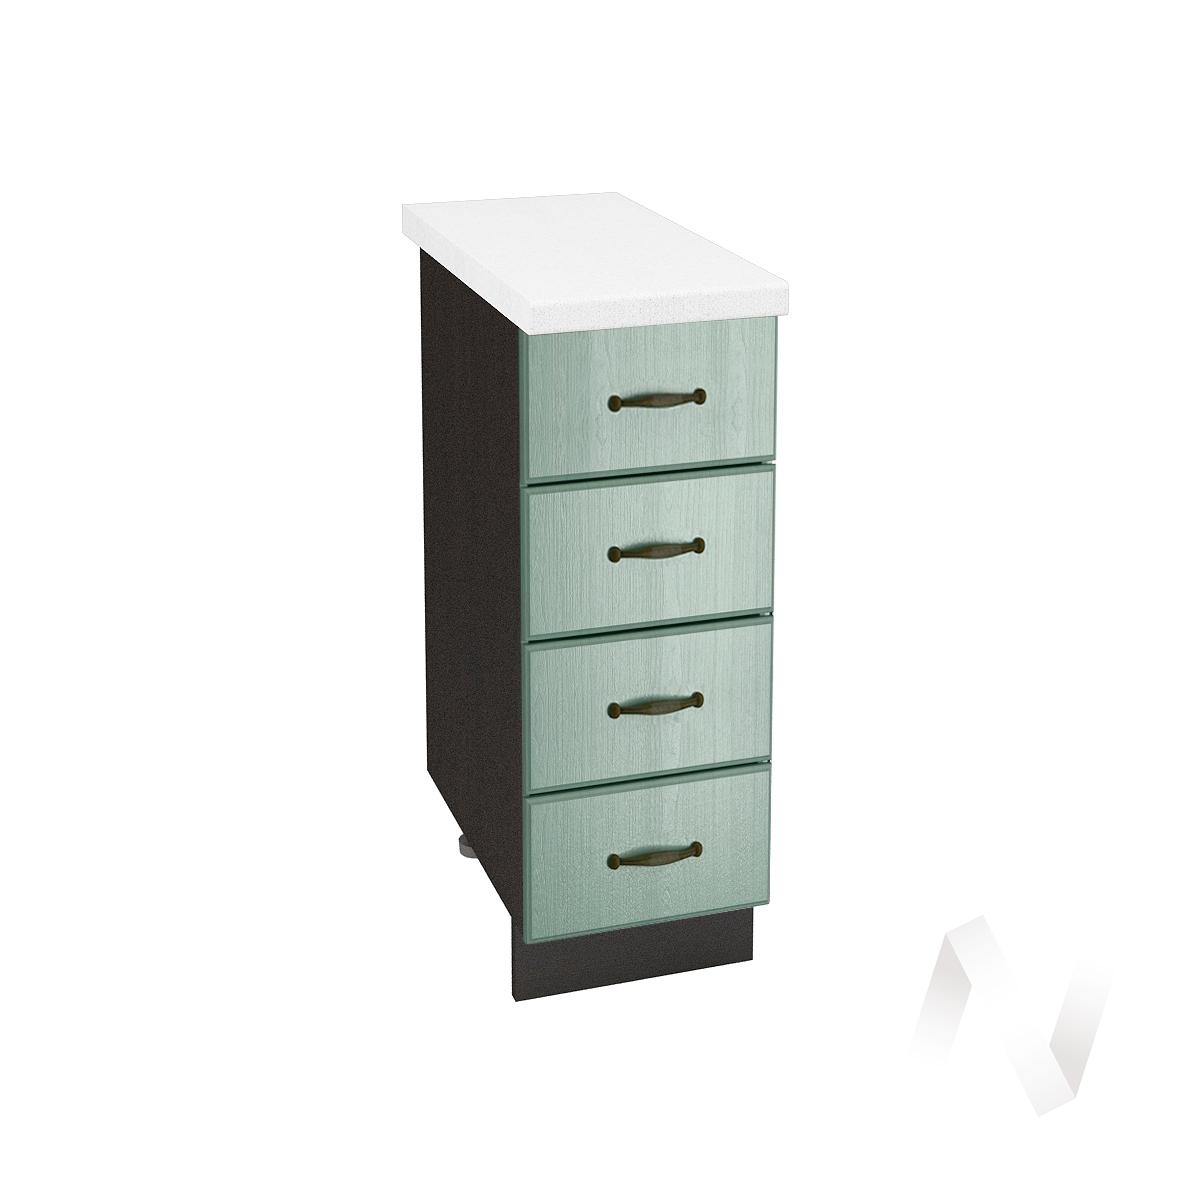 "Кухня ""Прованс"": Шкаф нижний с 4-мя ящиками 300, ШН4Я 300 (корпус венге)"